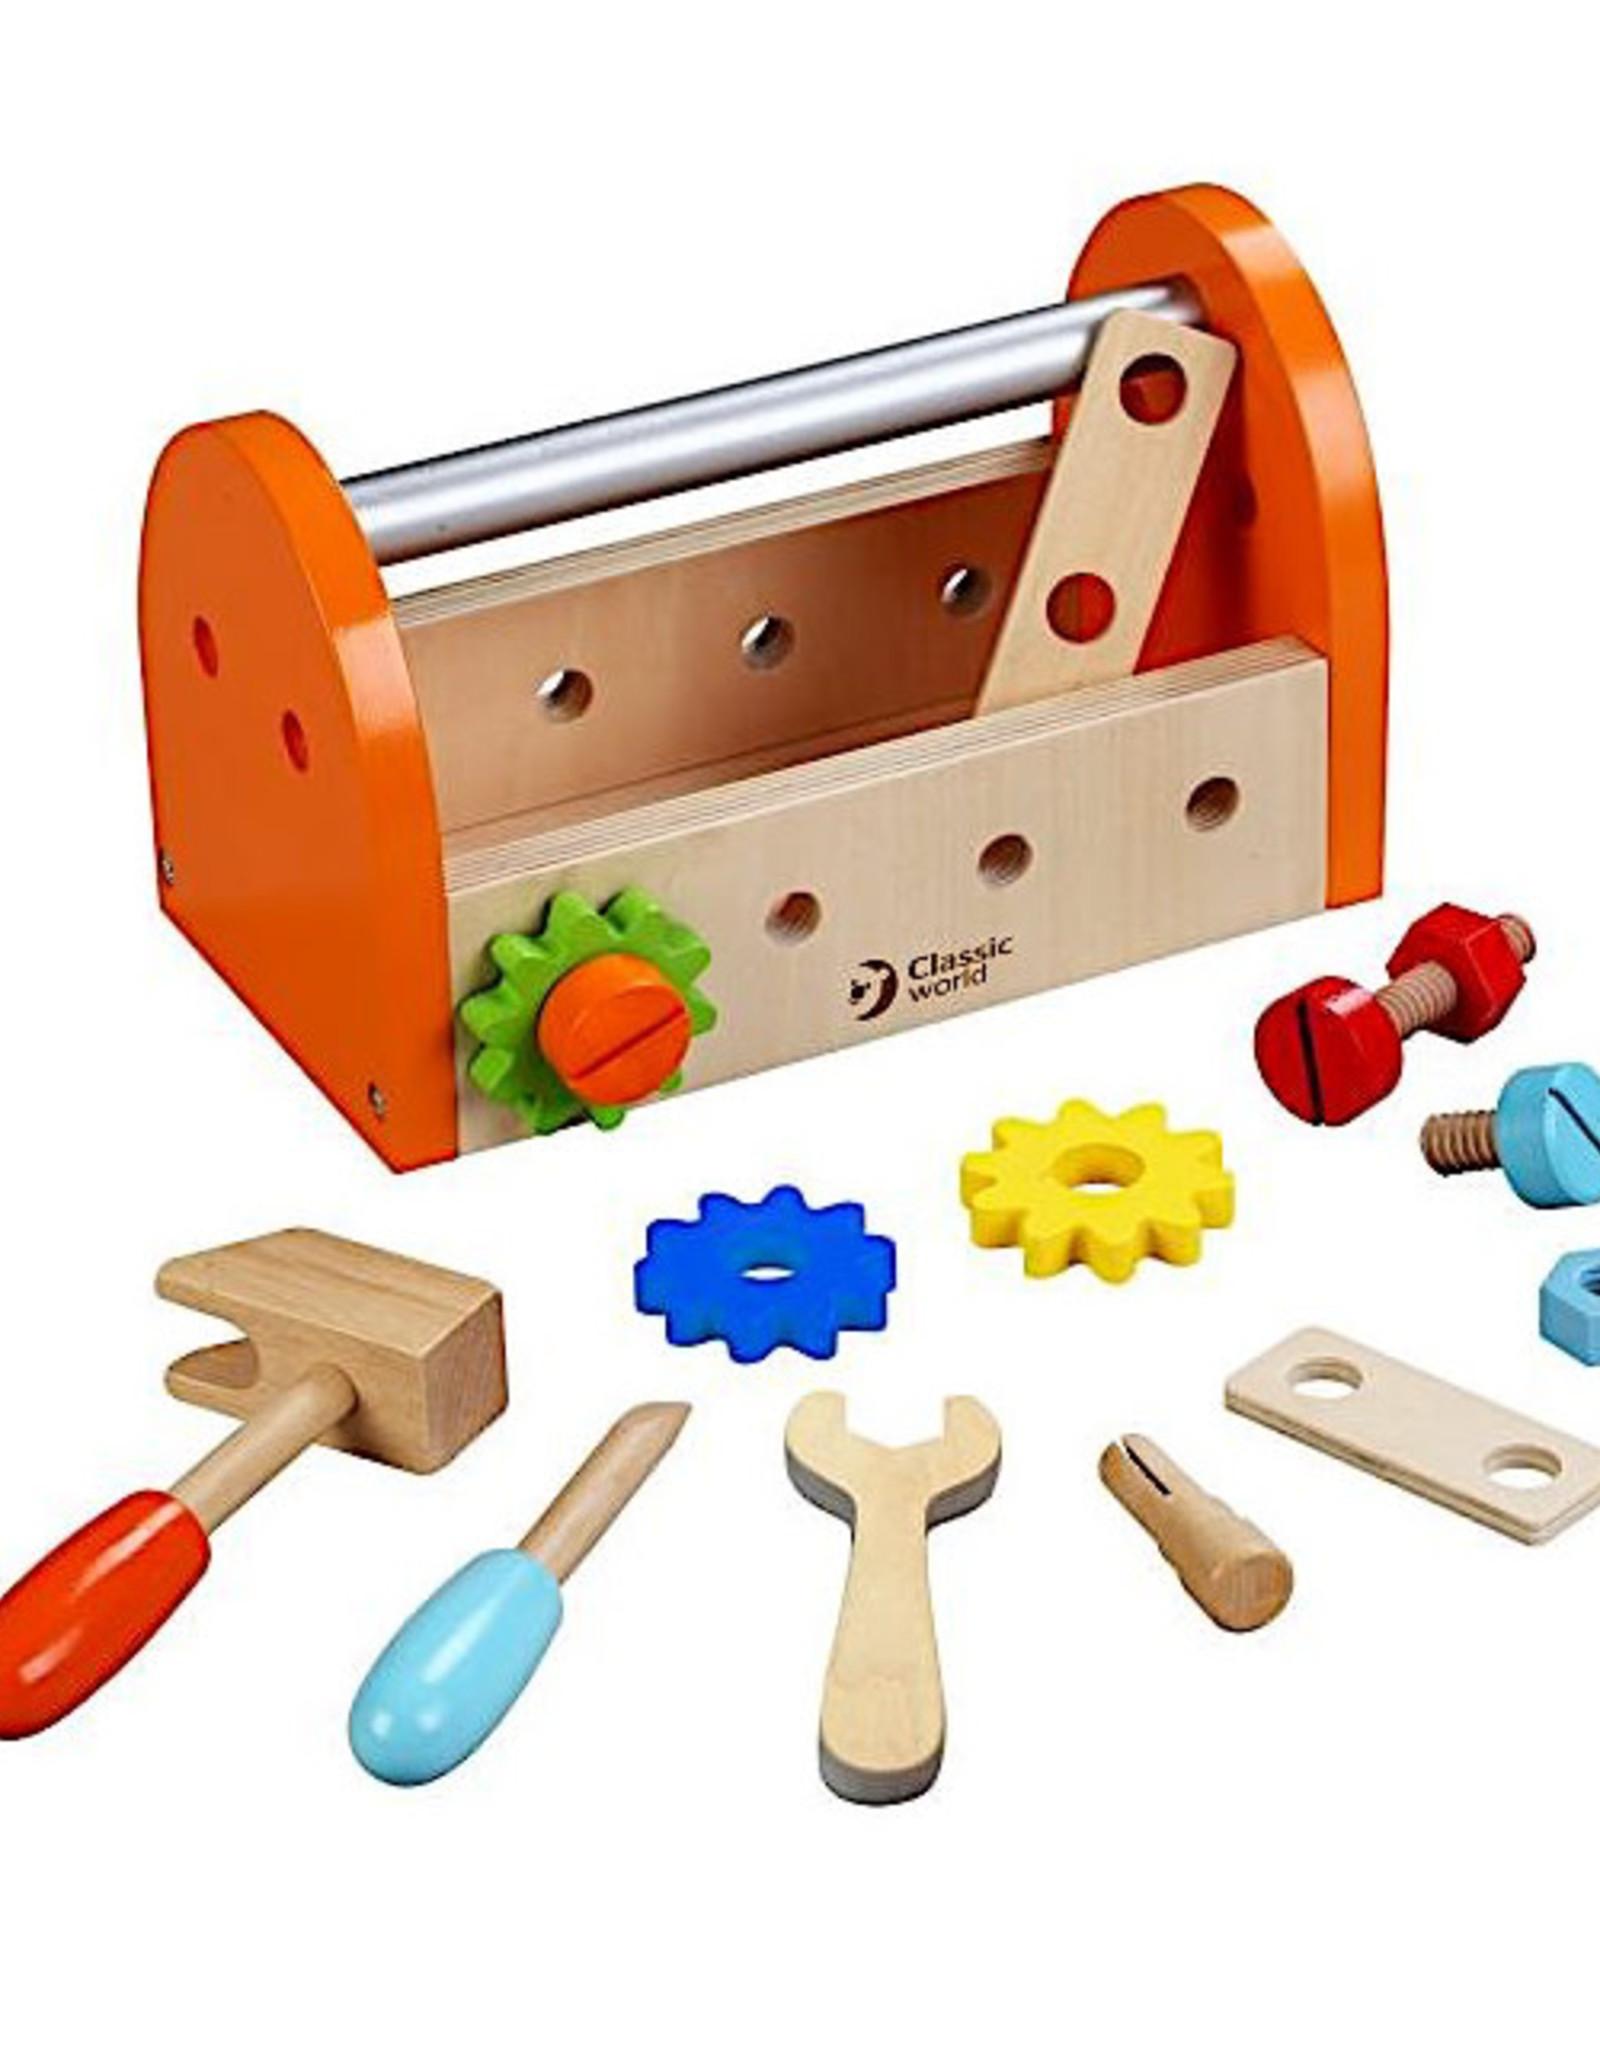 Classic World Small Carpenter Set